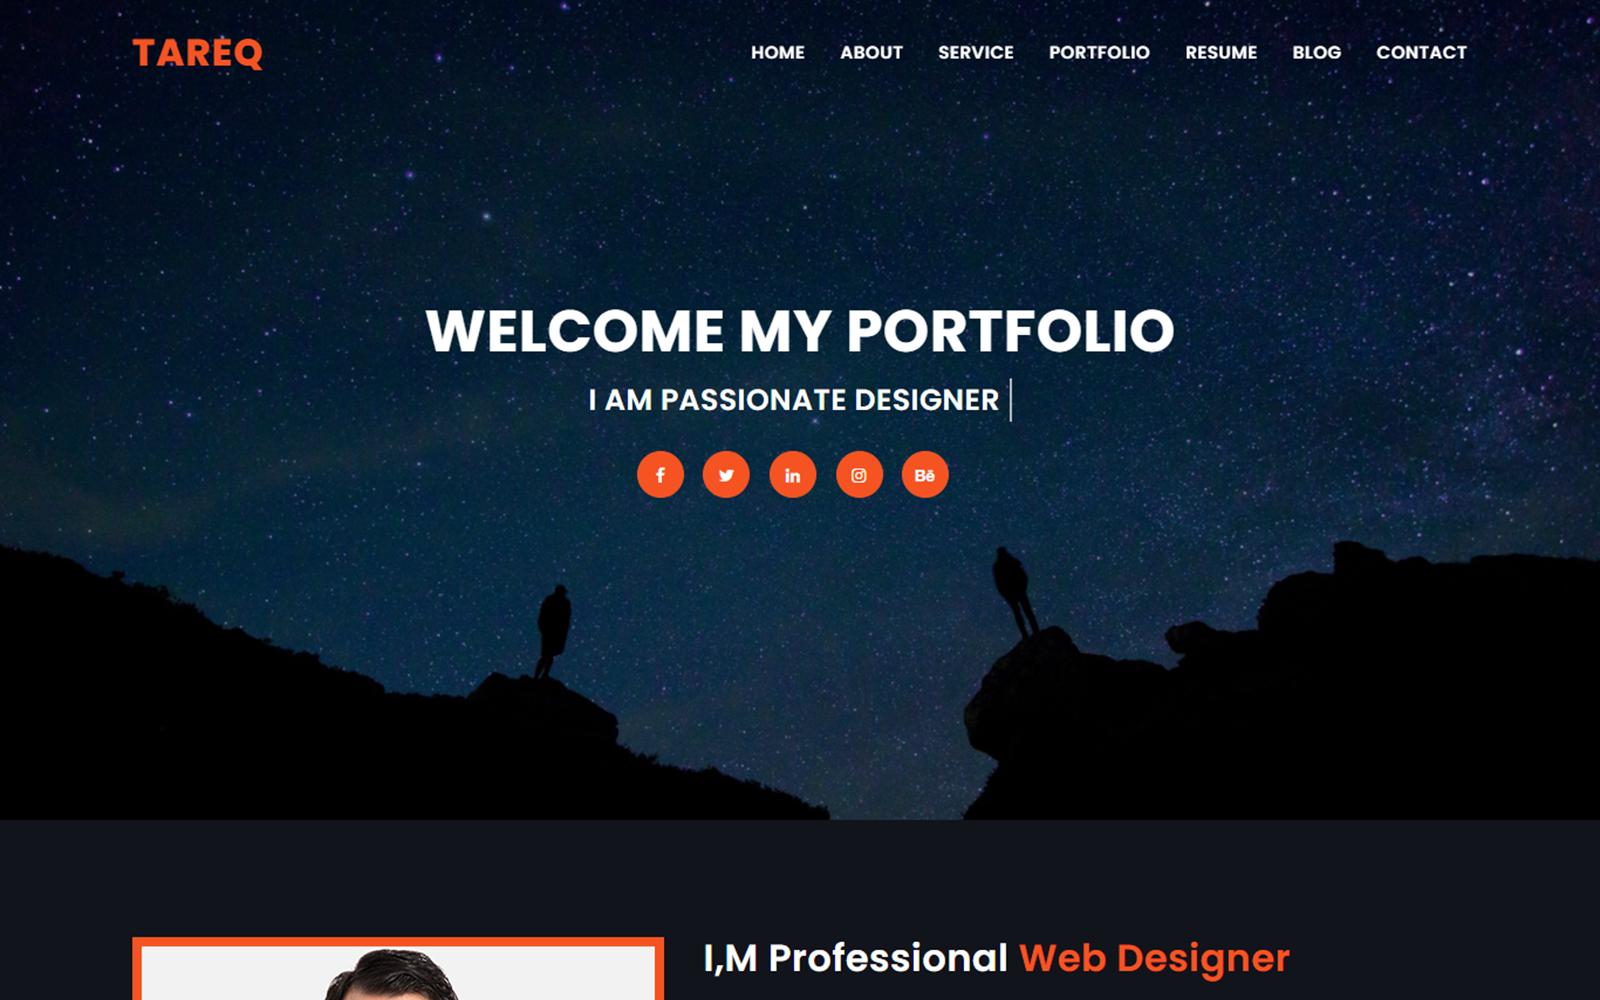 Tareq Personal Portfolio Landing Page Template